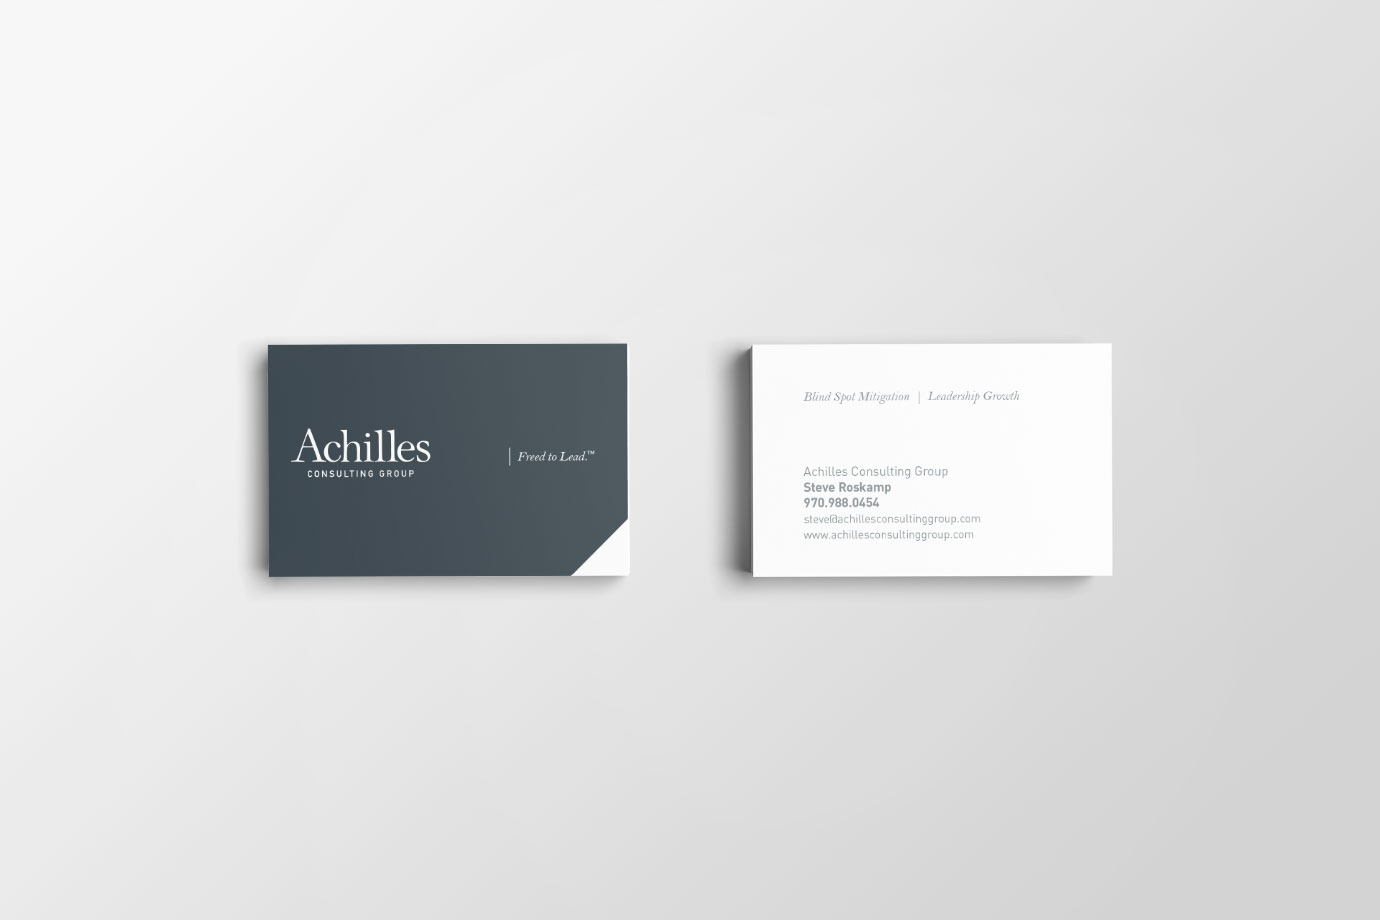 Achilles_Business_Card_Mockup_90-2-Stack.jpg